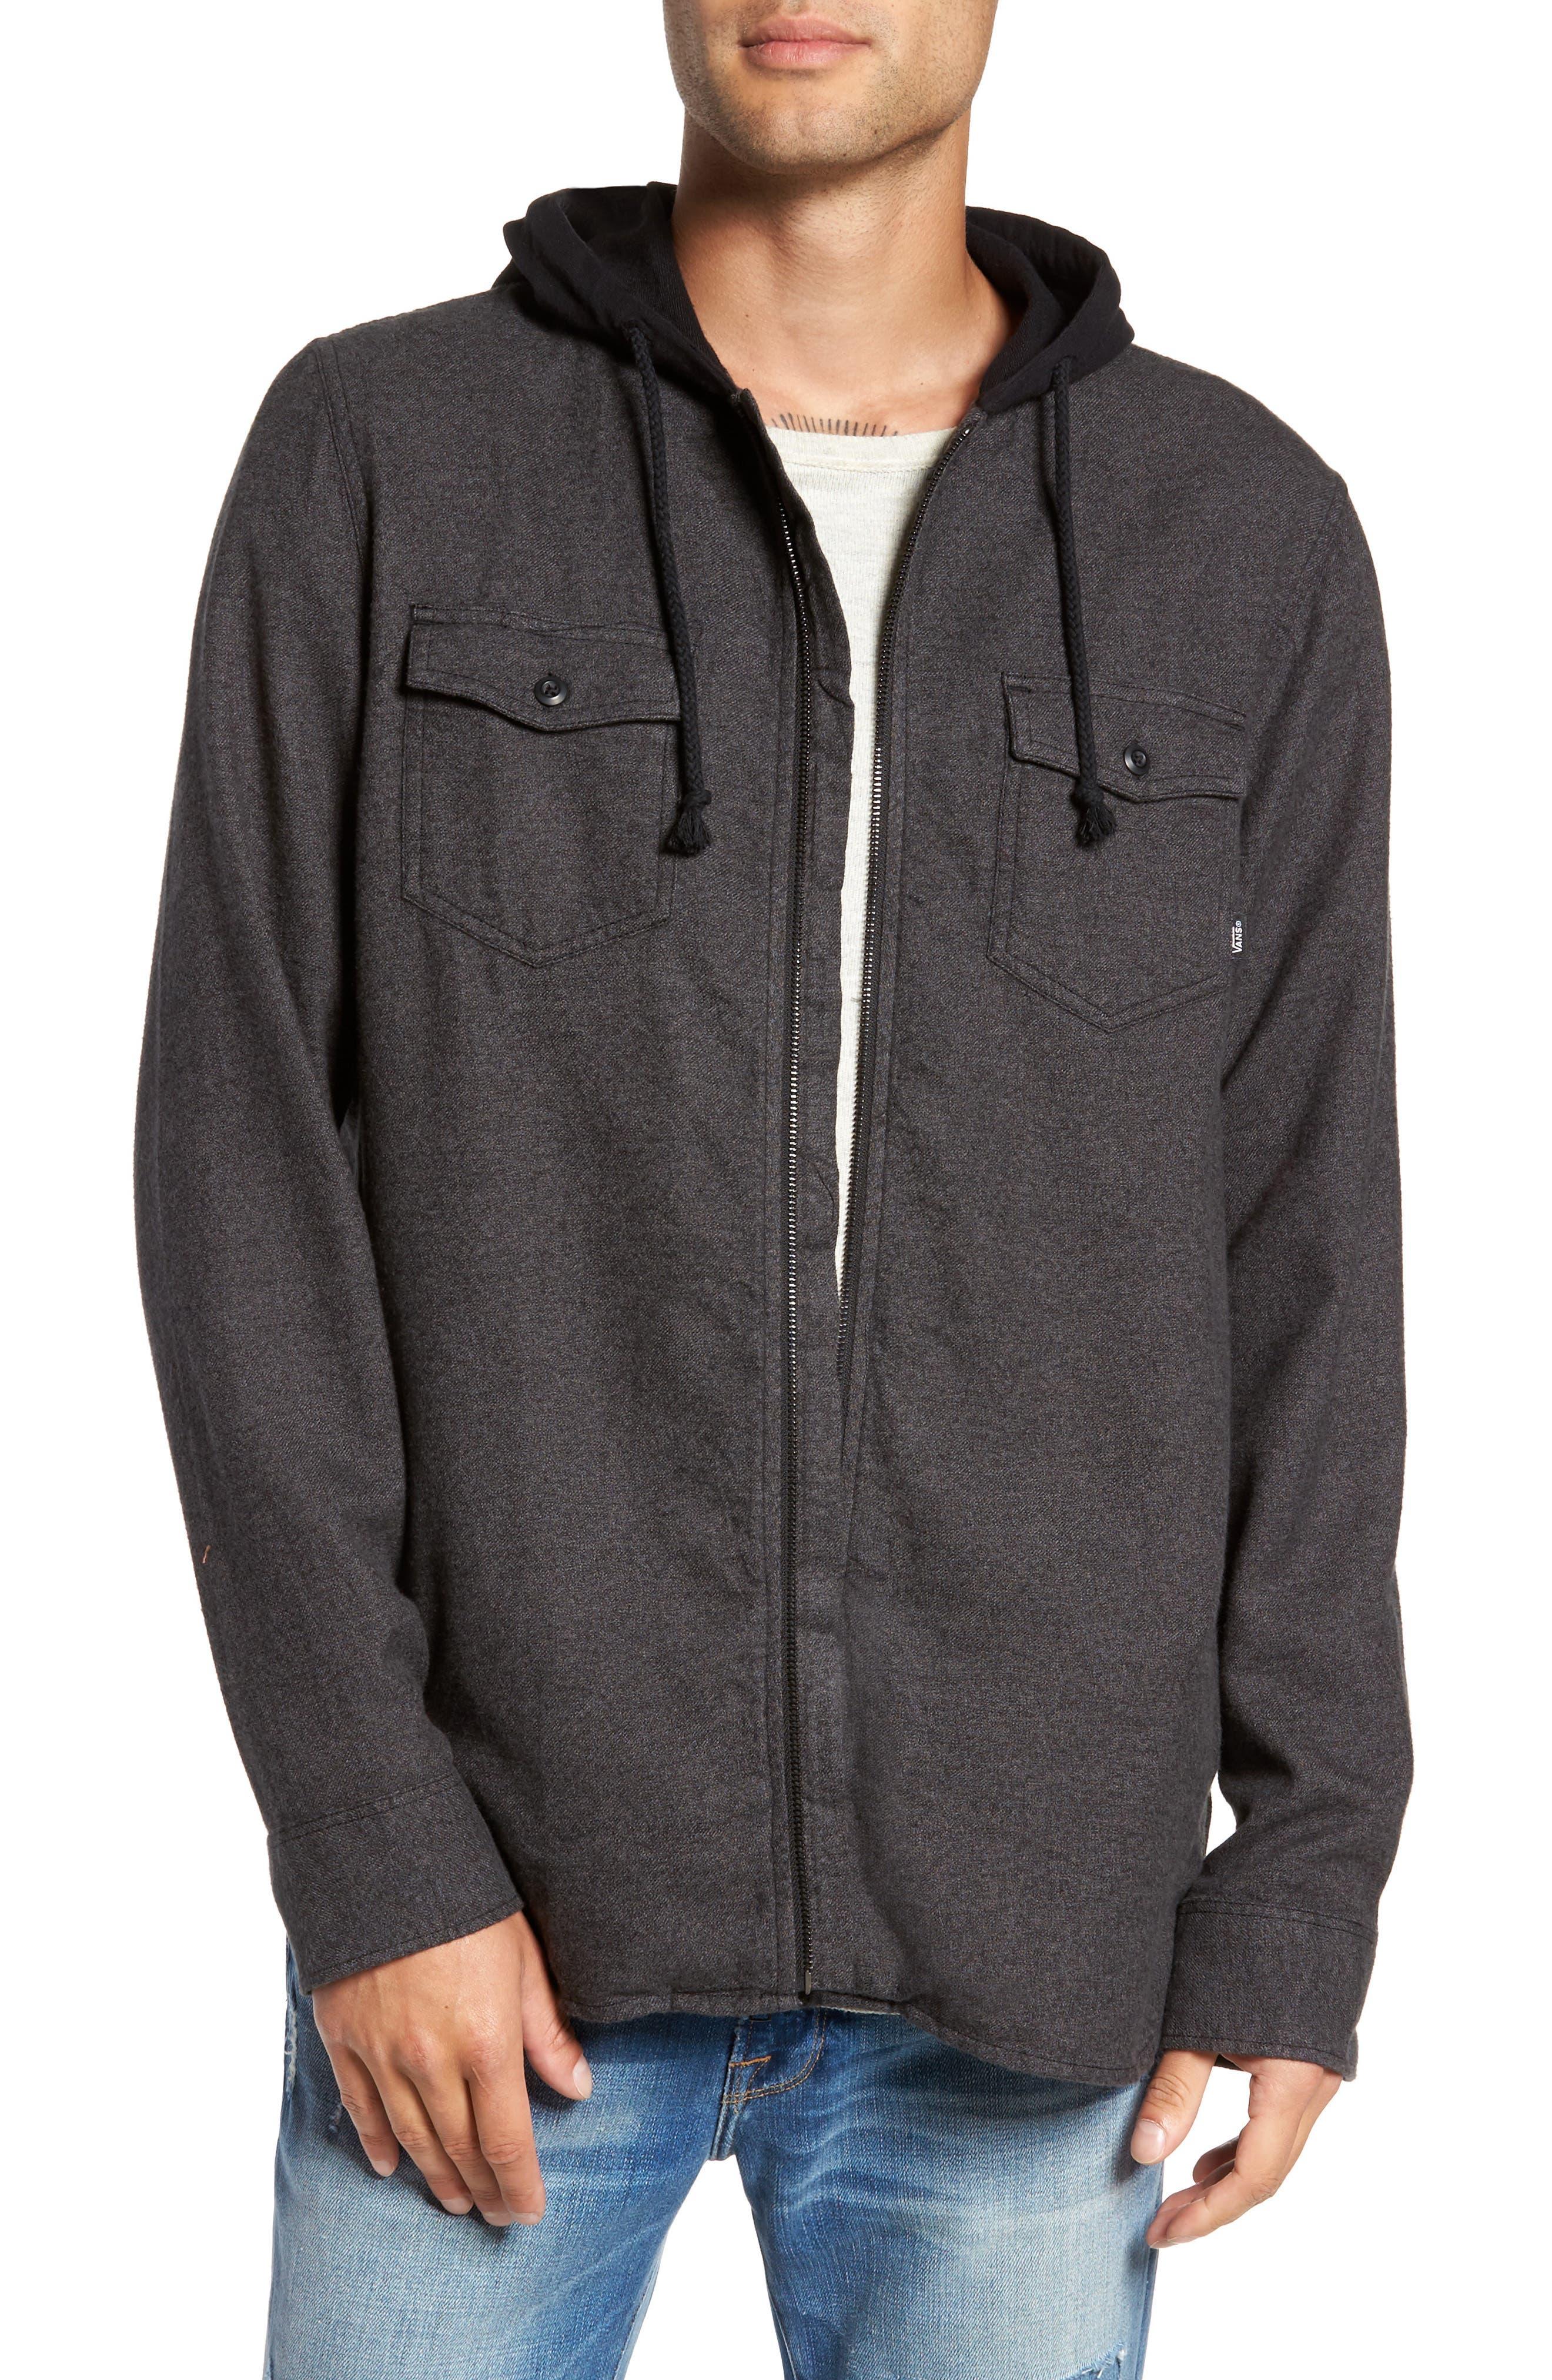 Alternate Image 1 Selected - Vans Never Mind Hooded Zip Shirt Jacket